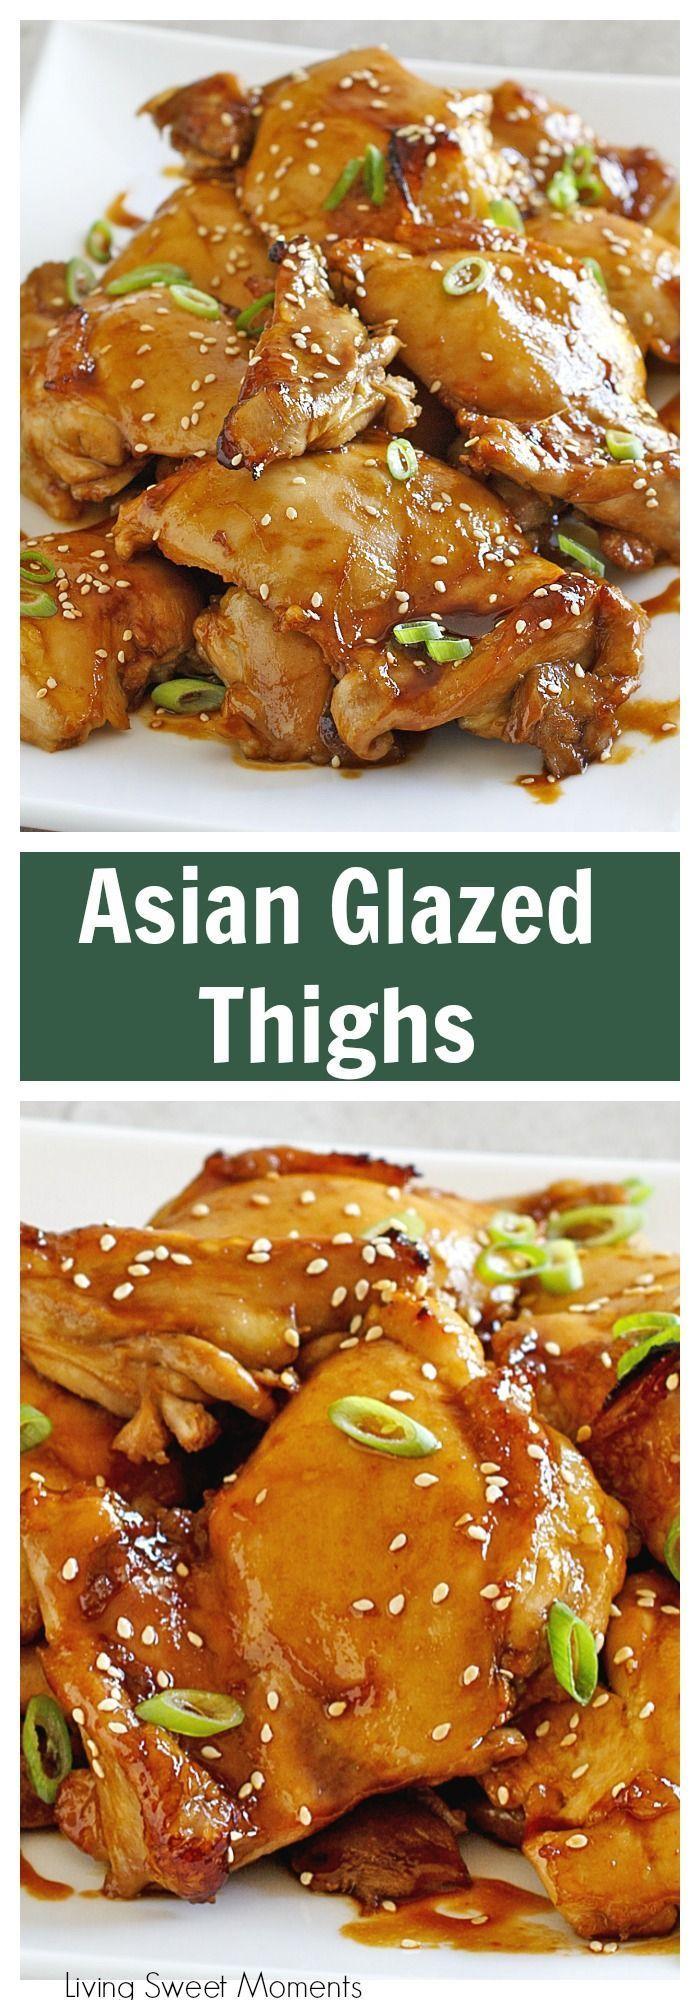 Asian Glazed Chicken Thighs - This easy dinner recipe ...